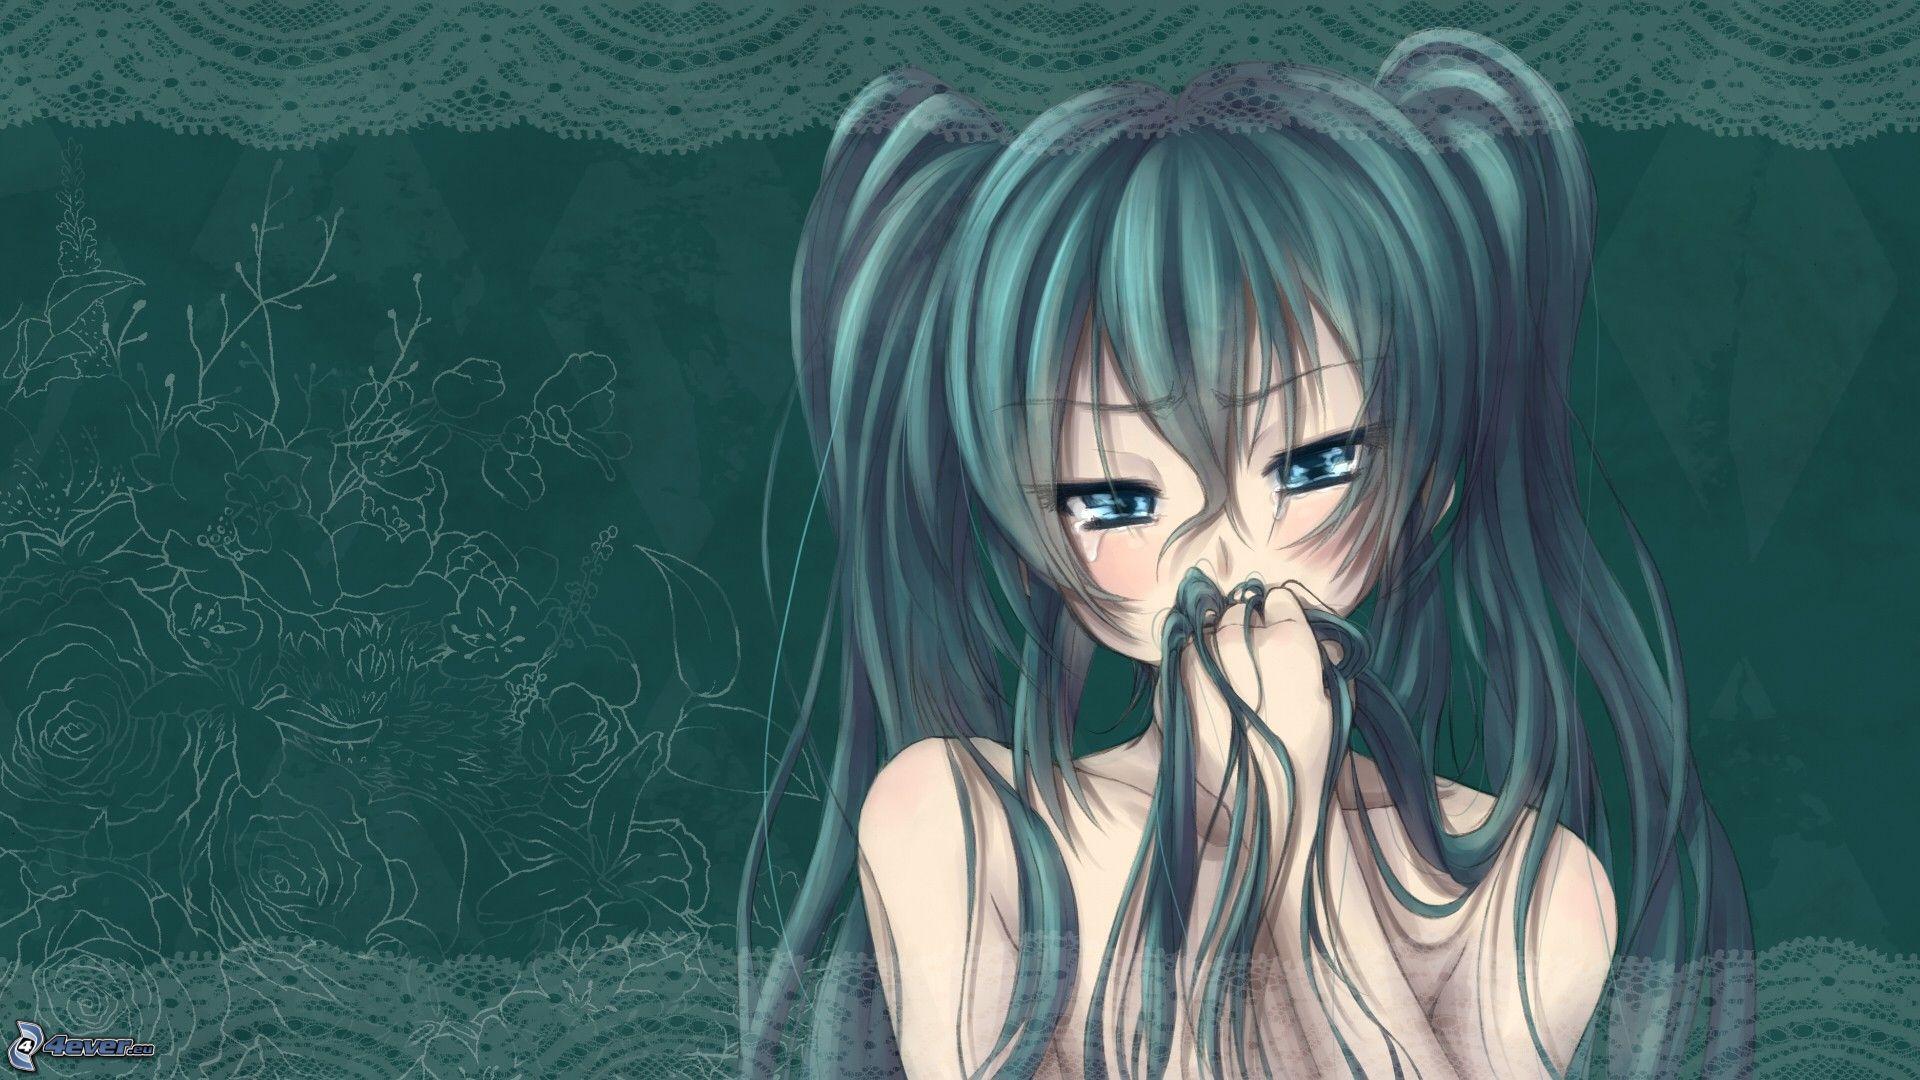 Anime fille - Image de manga triste ...